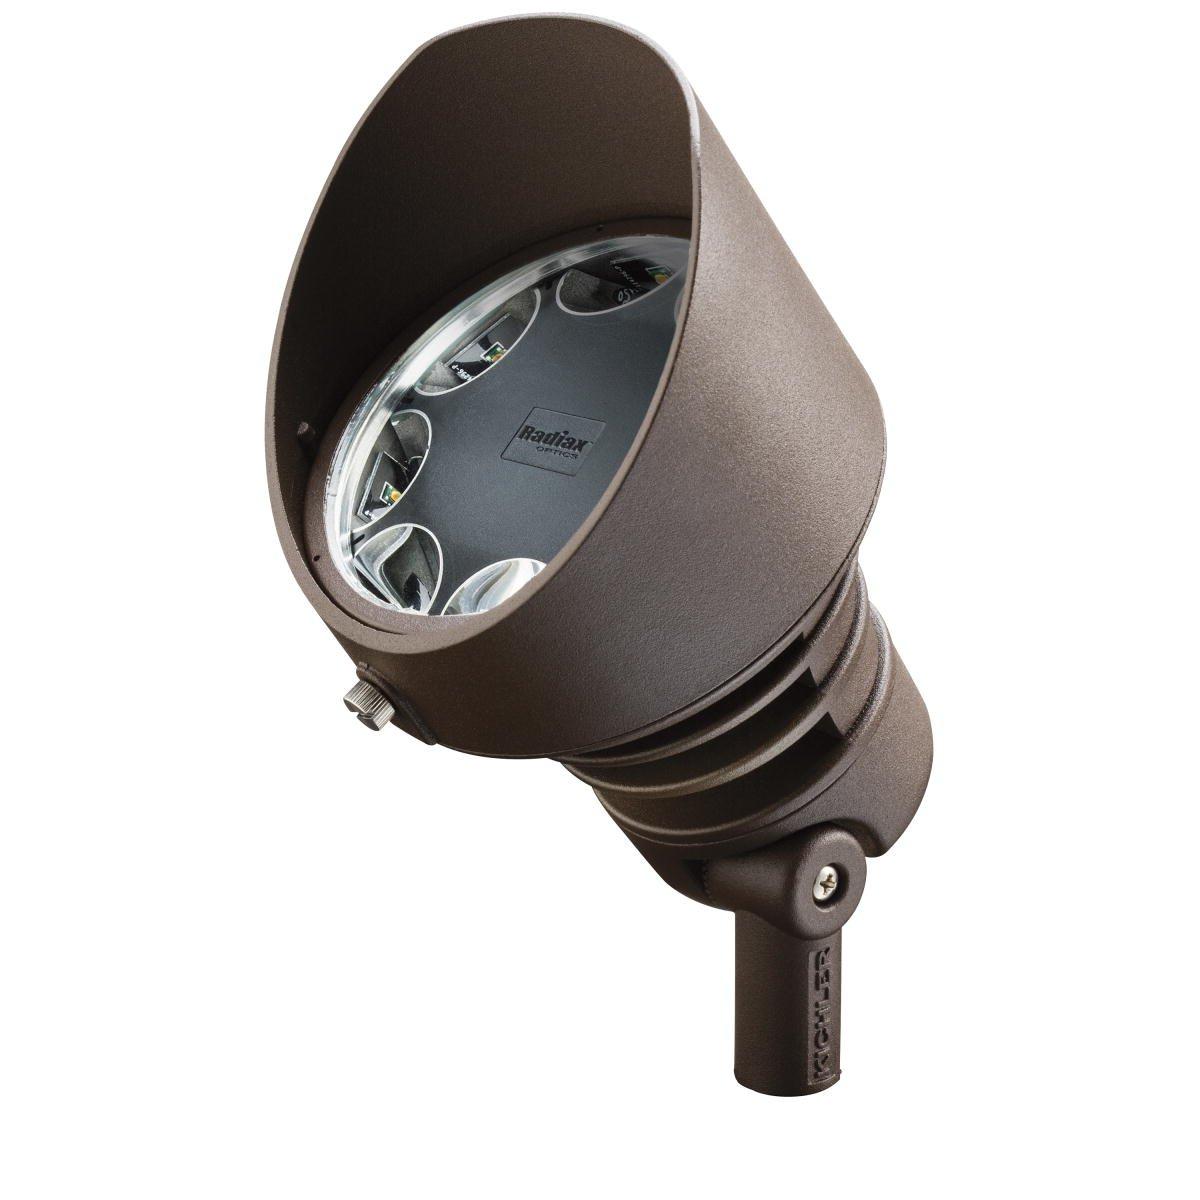 Kichler Lighting 16012AZT27 Landscape Aluminum 12V/21-watt 8-Diode LED 10-Degree Adjustable Spot Light, Textured Architectural Bronze